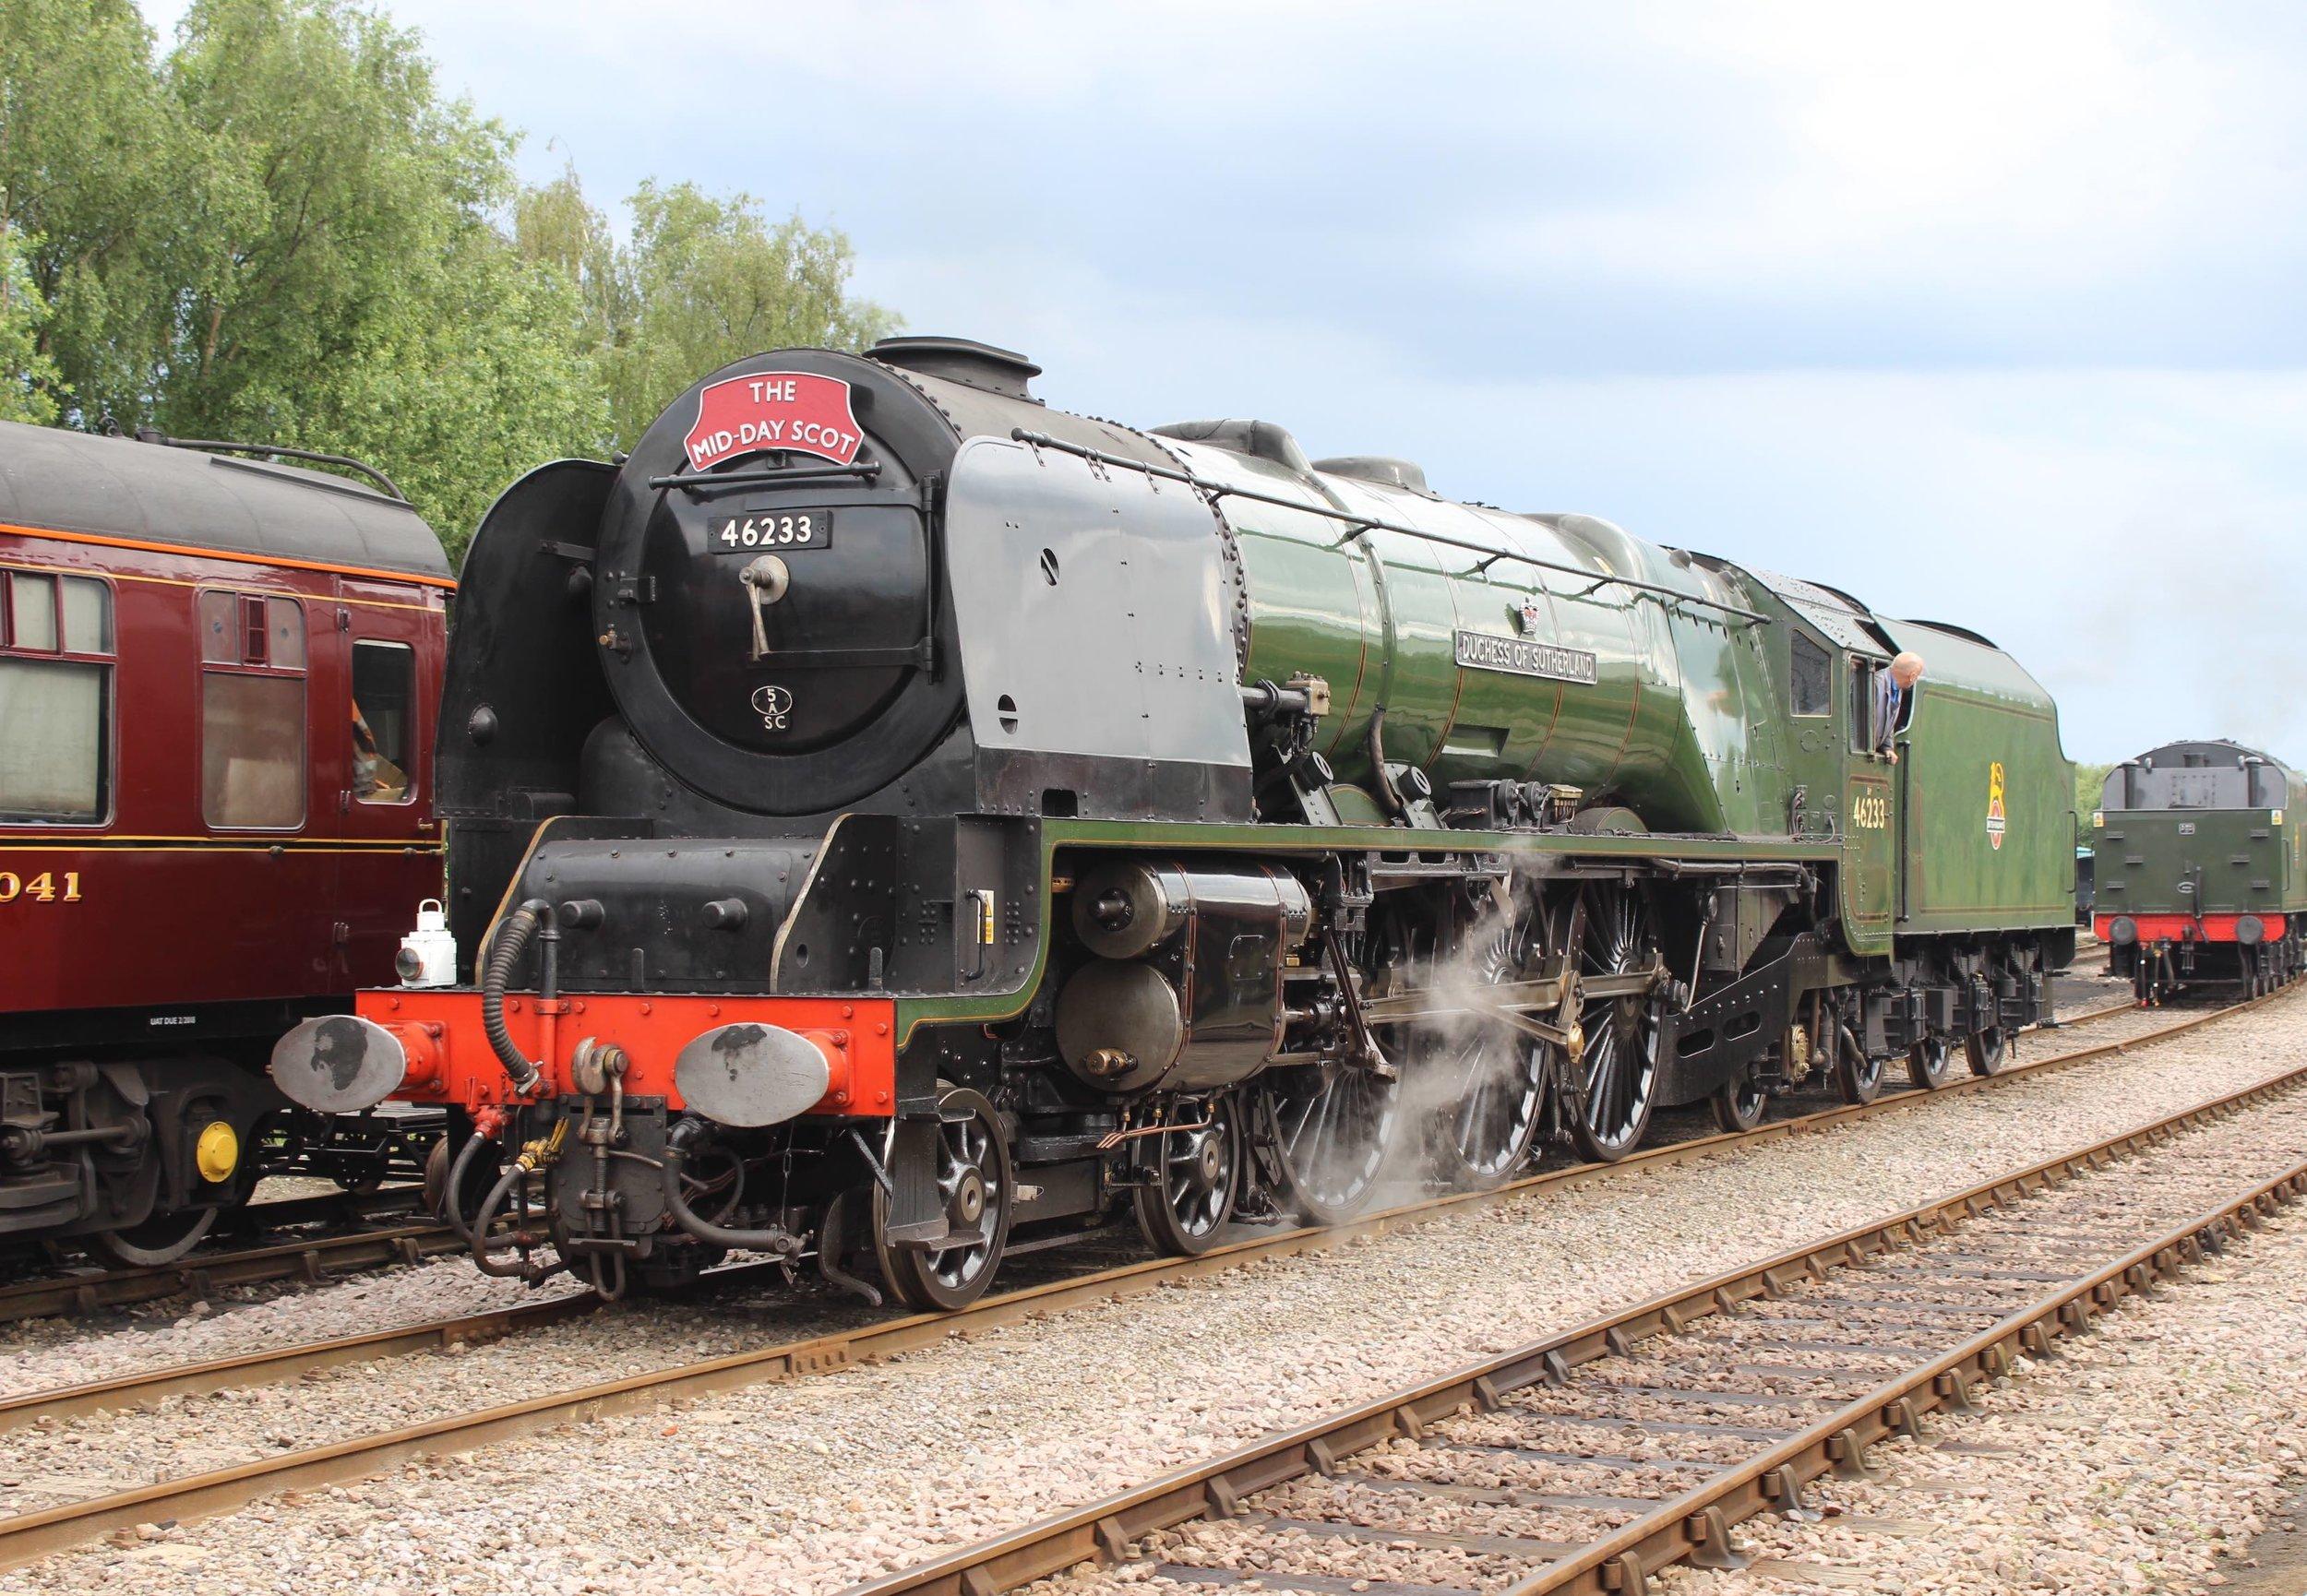 'Princess Coronation' No. 46233  Duchess of Sutherland  backs down onto No. 46100  Royal Scot  at Dereham on the Mid-Norfolk Railway on June 25 2016. THOMAS BRIGHT/SR